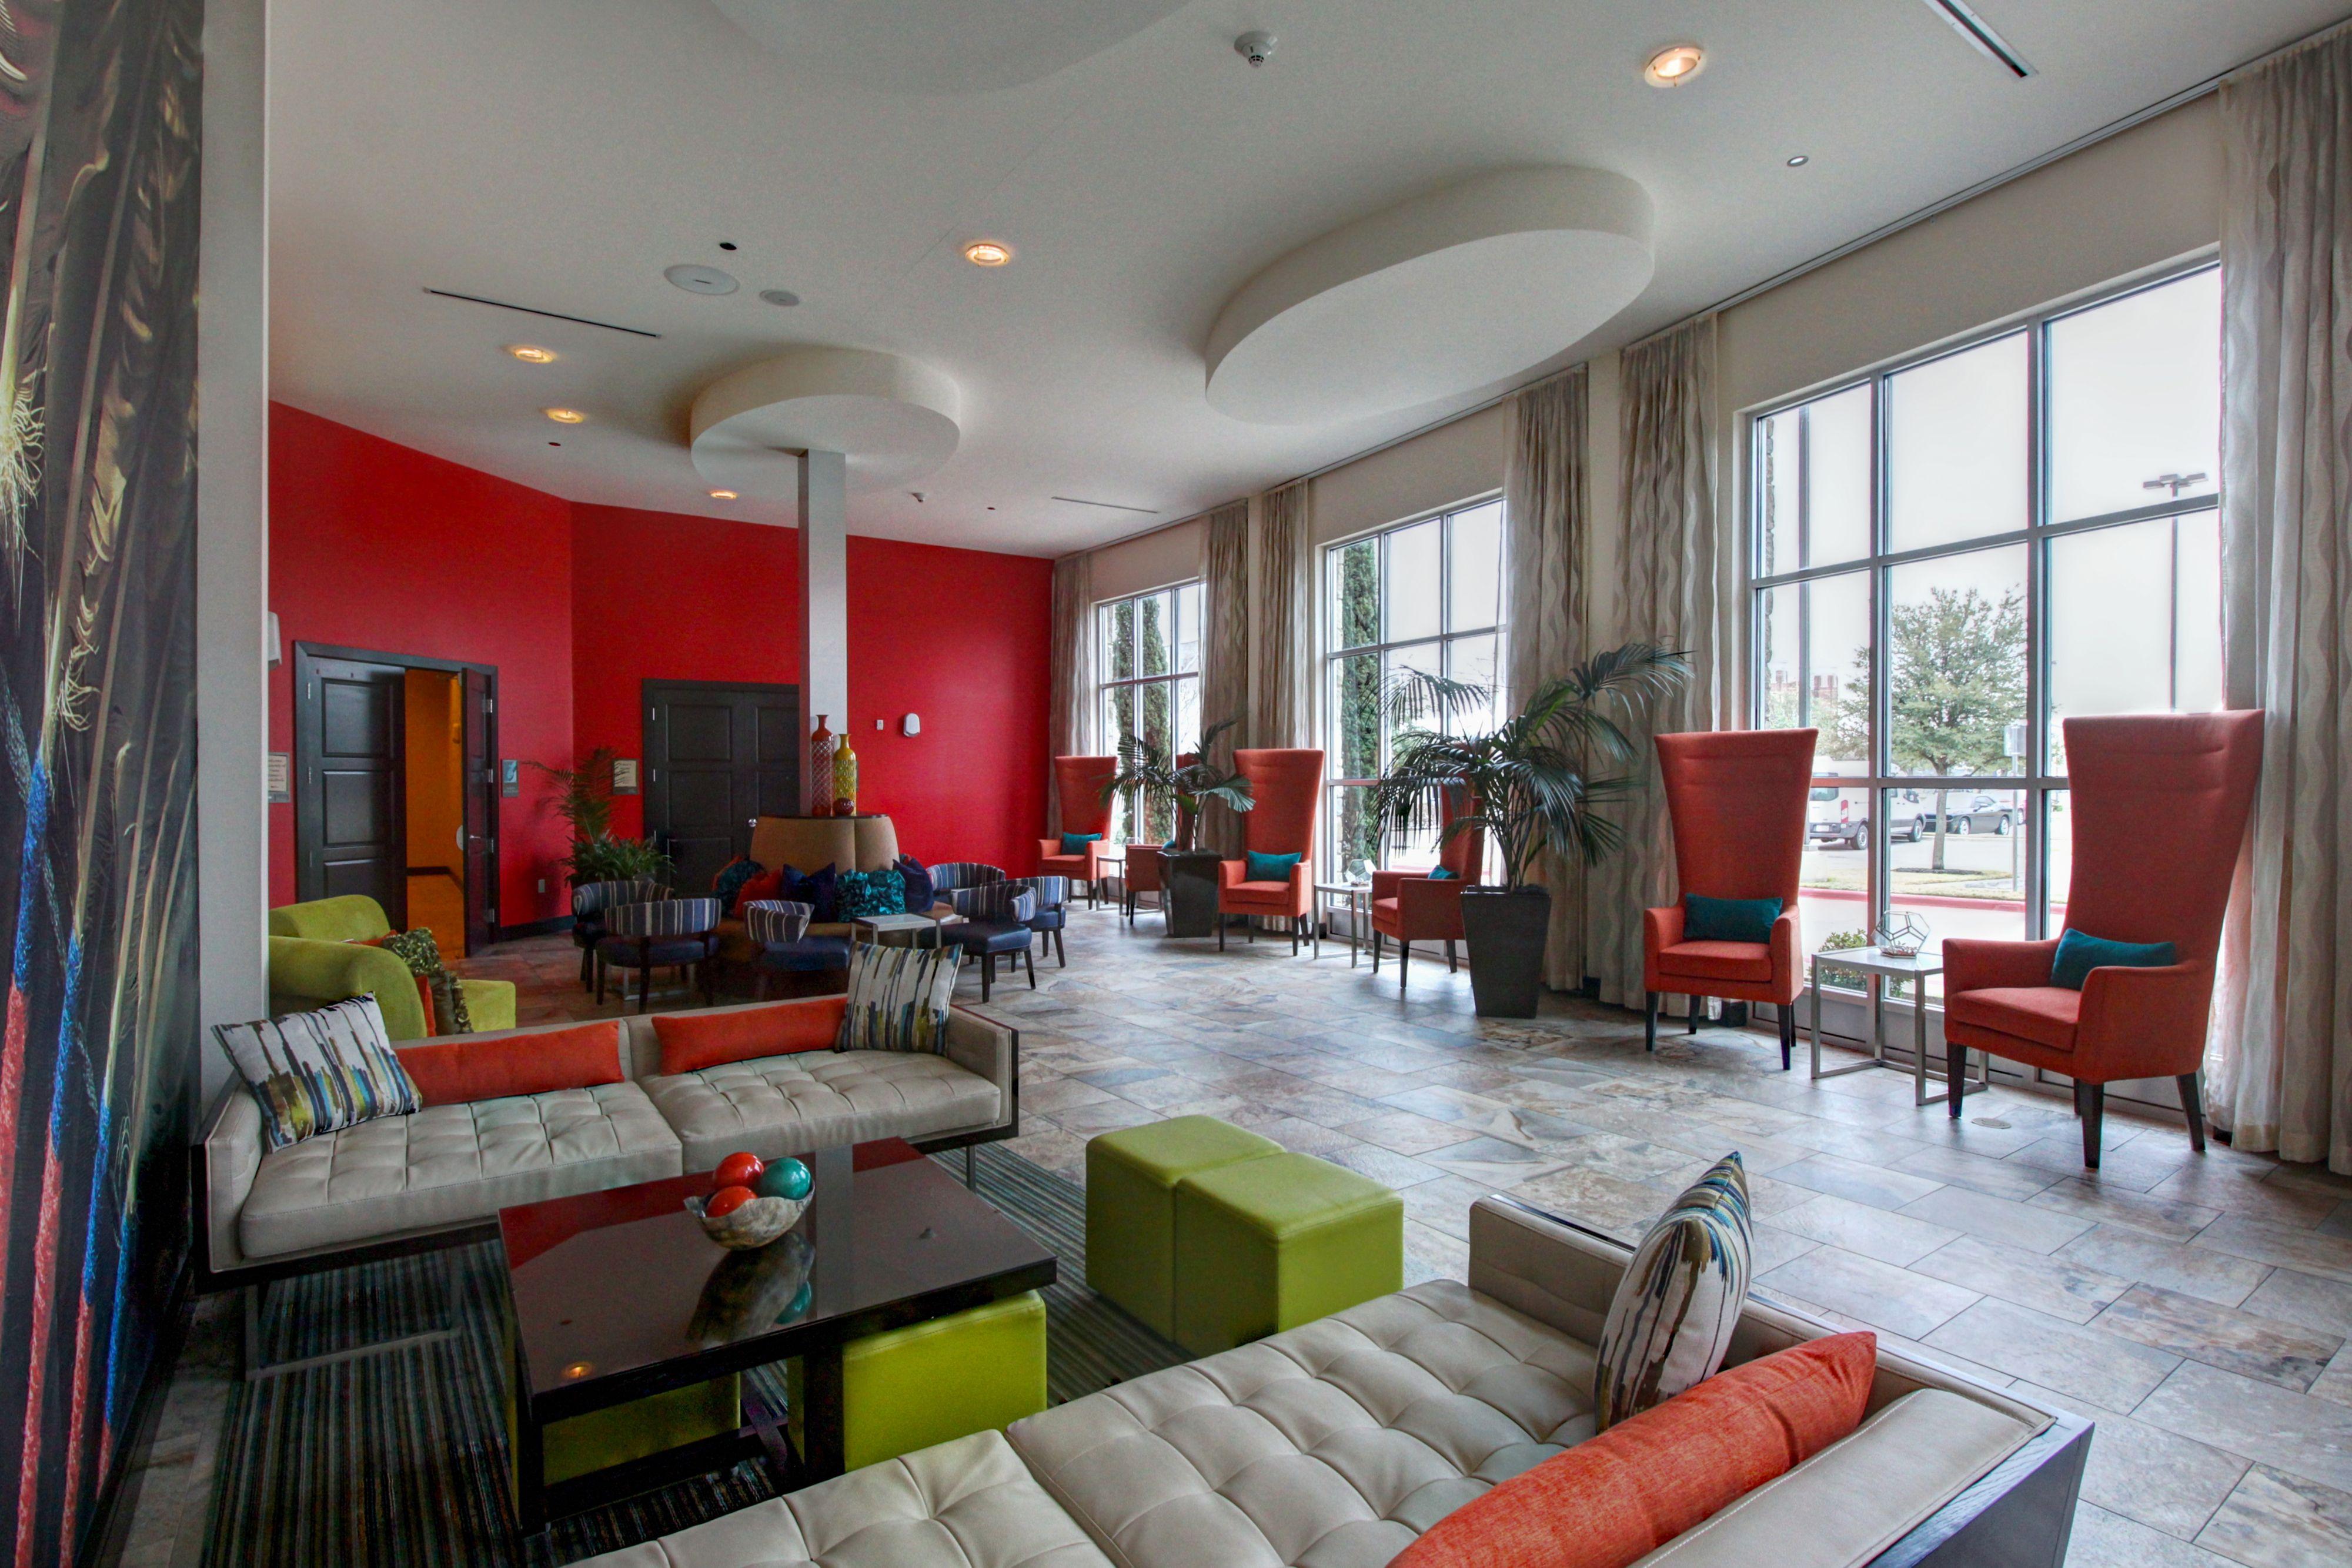 hotel indigo waco baylor waco texas tx. Black Bedroom Furniture Sets. Home Design Ideas